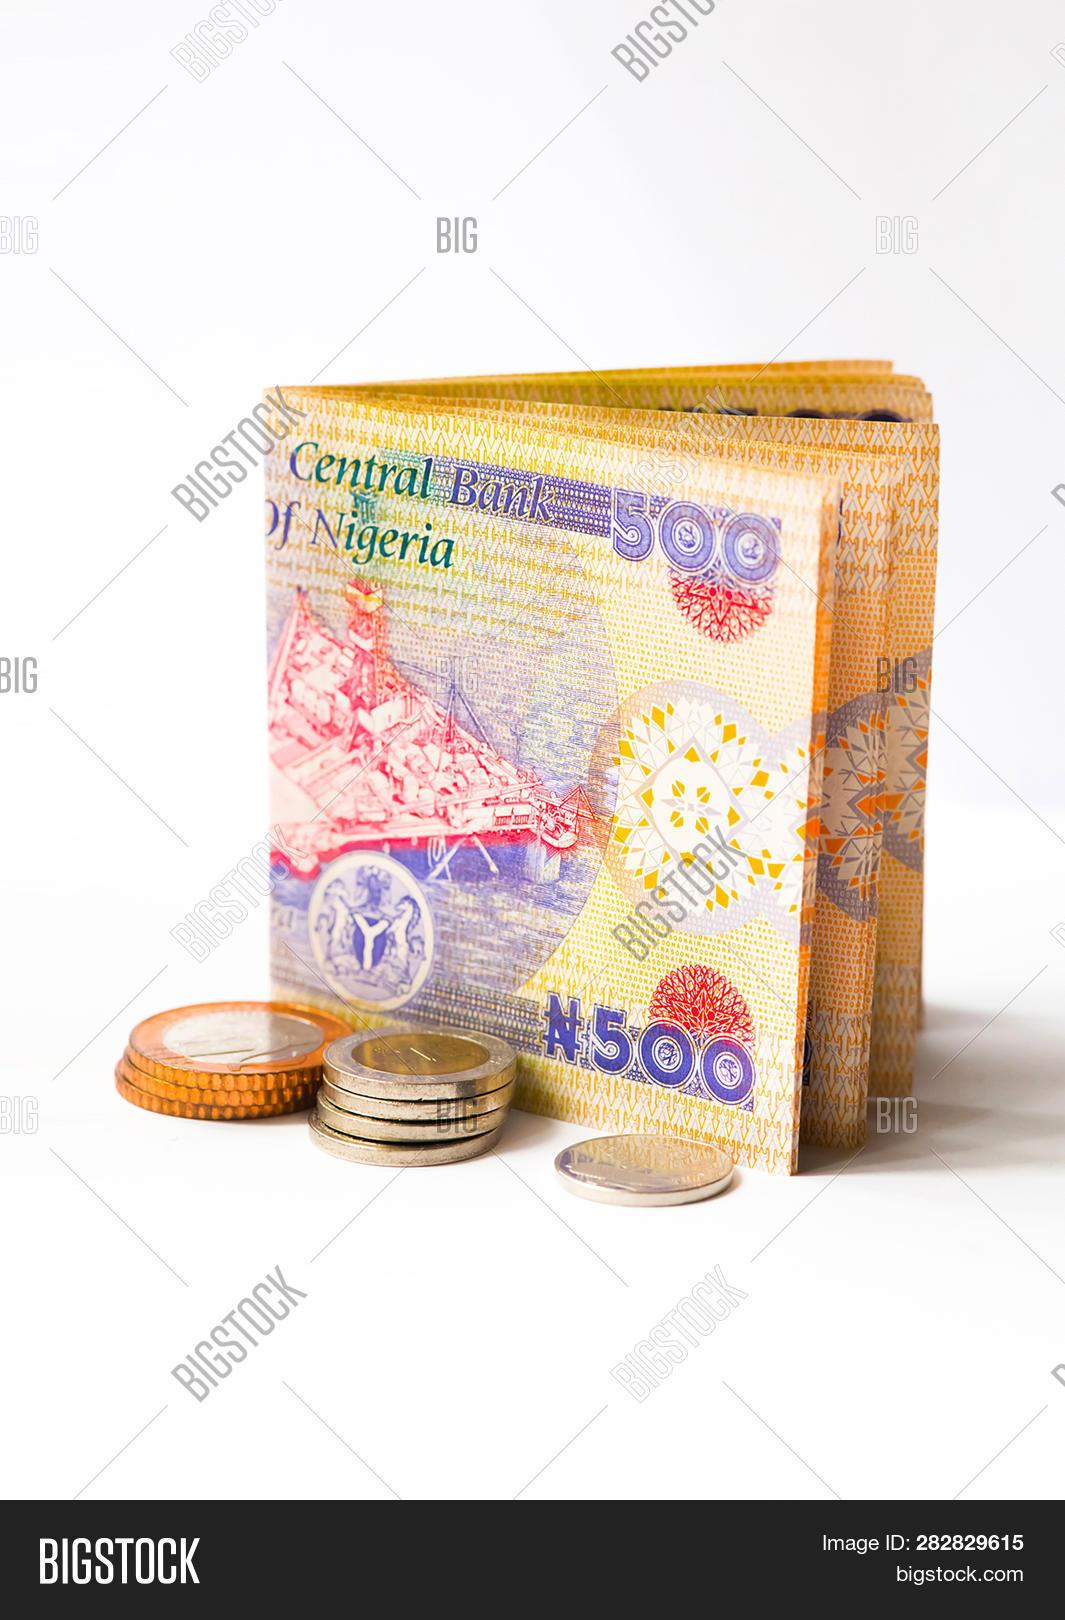 Nigerian Currency - Image & Photo (Free Trial) | Bigstock